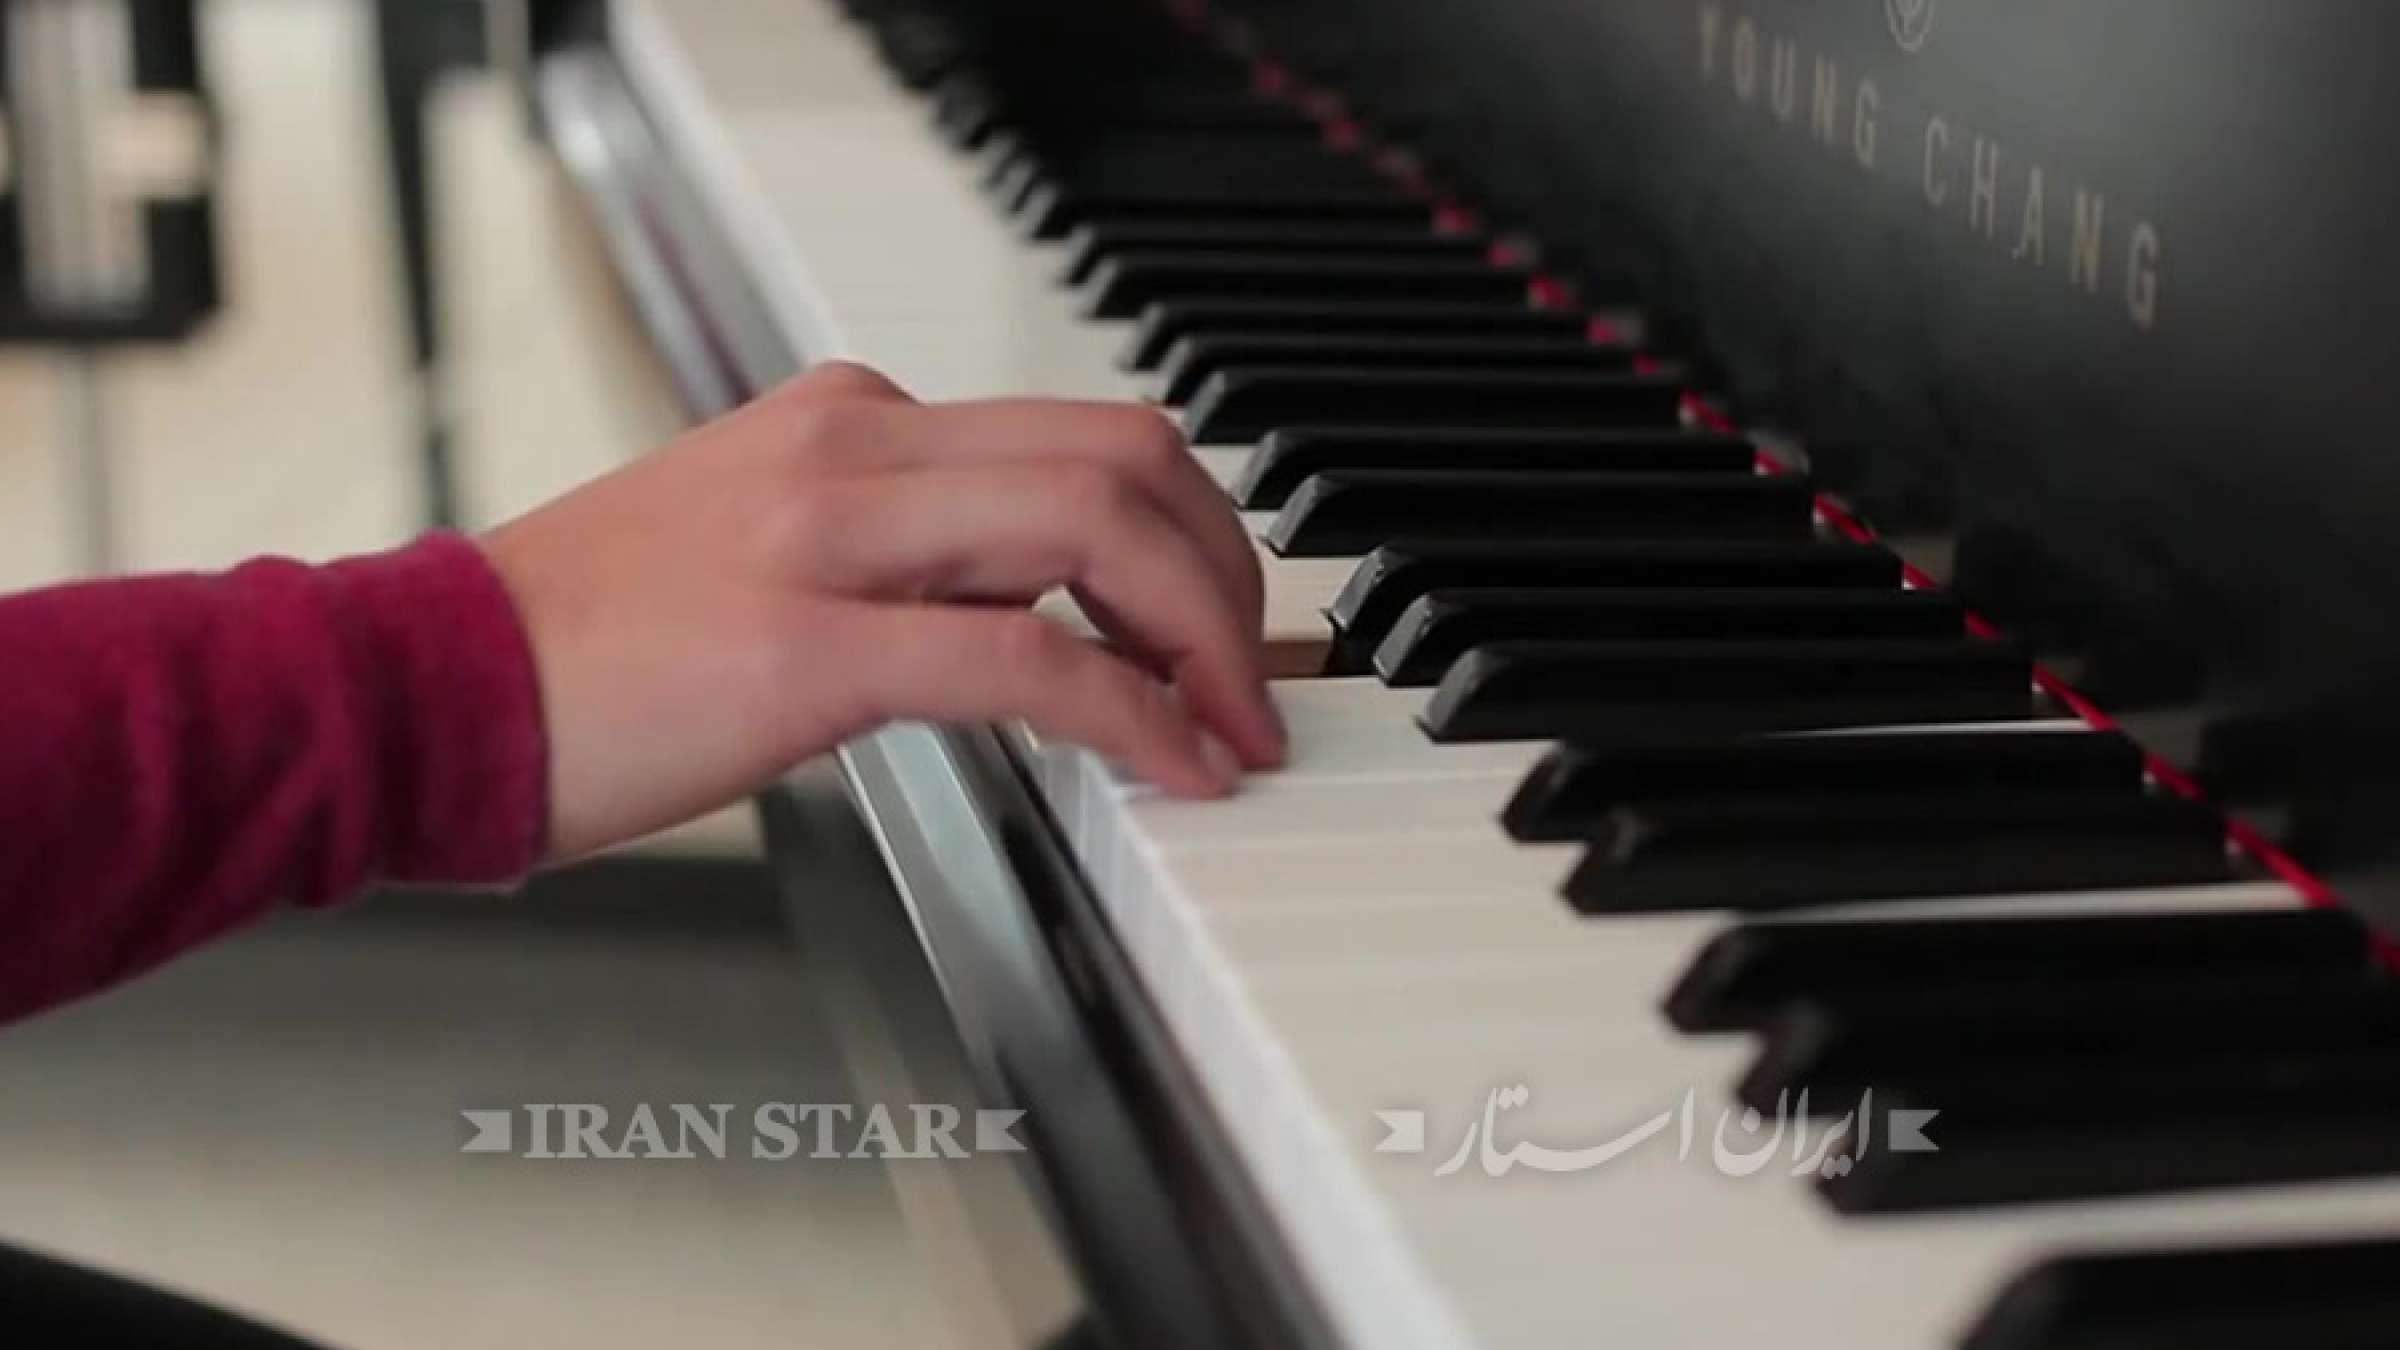 yad-gereftane-piano